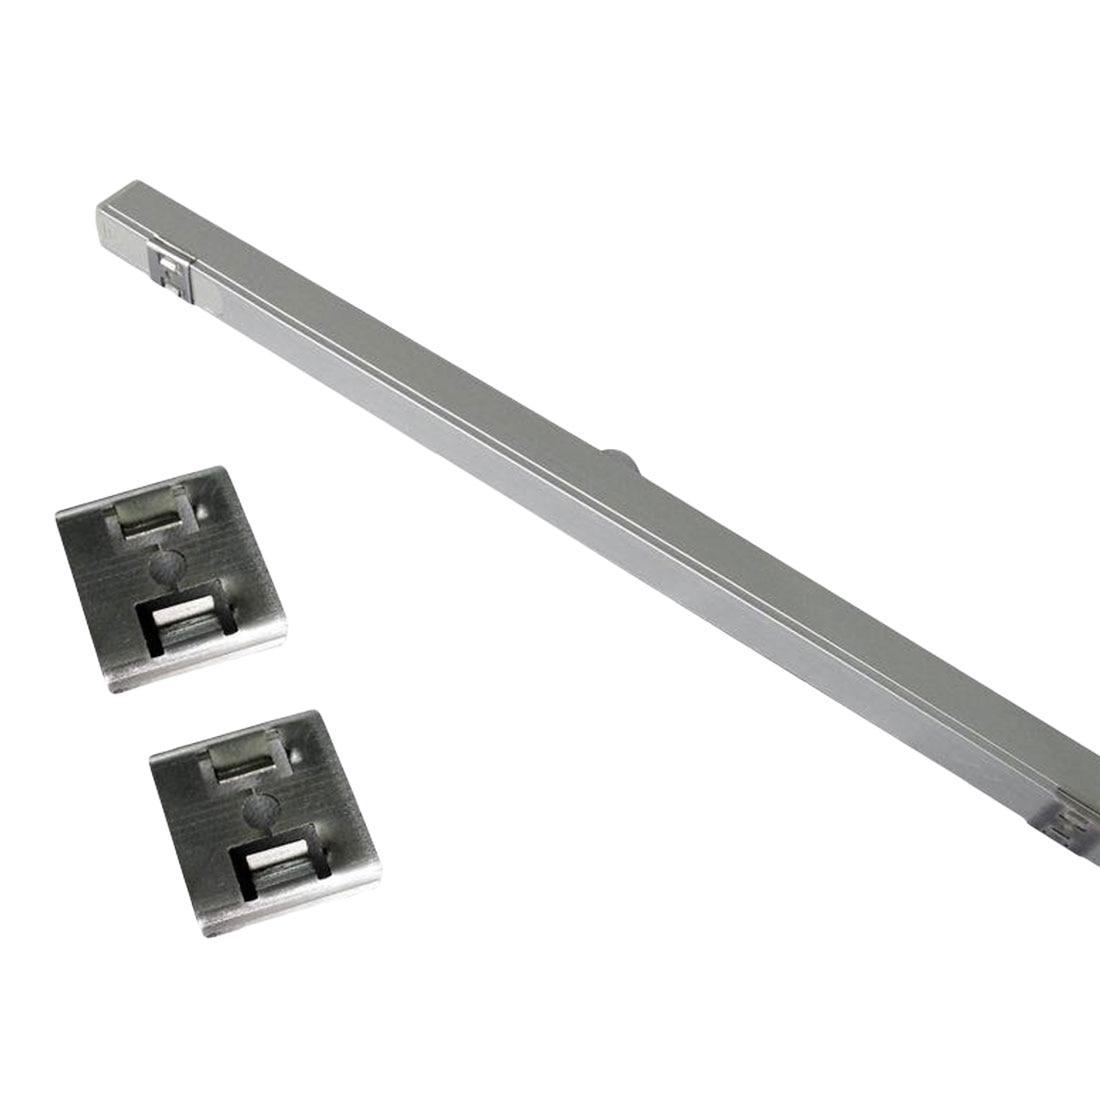 Casalife Led Cabinet Sensor Light: Sensor Closet Light 20 LED Wireless Activated Night Light